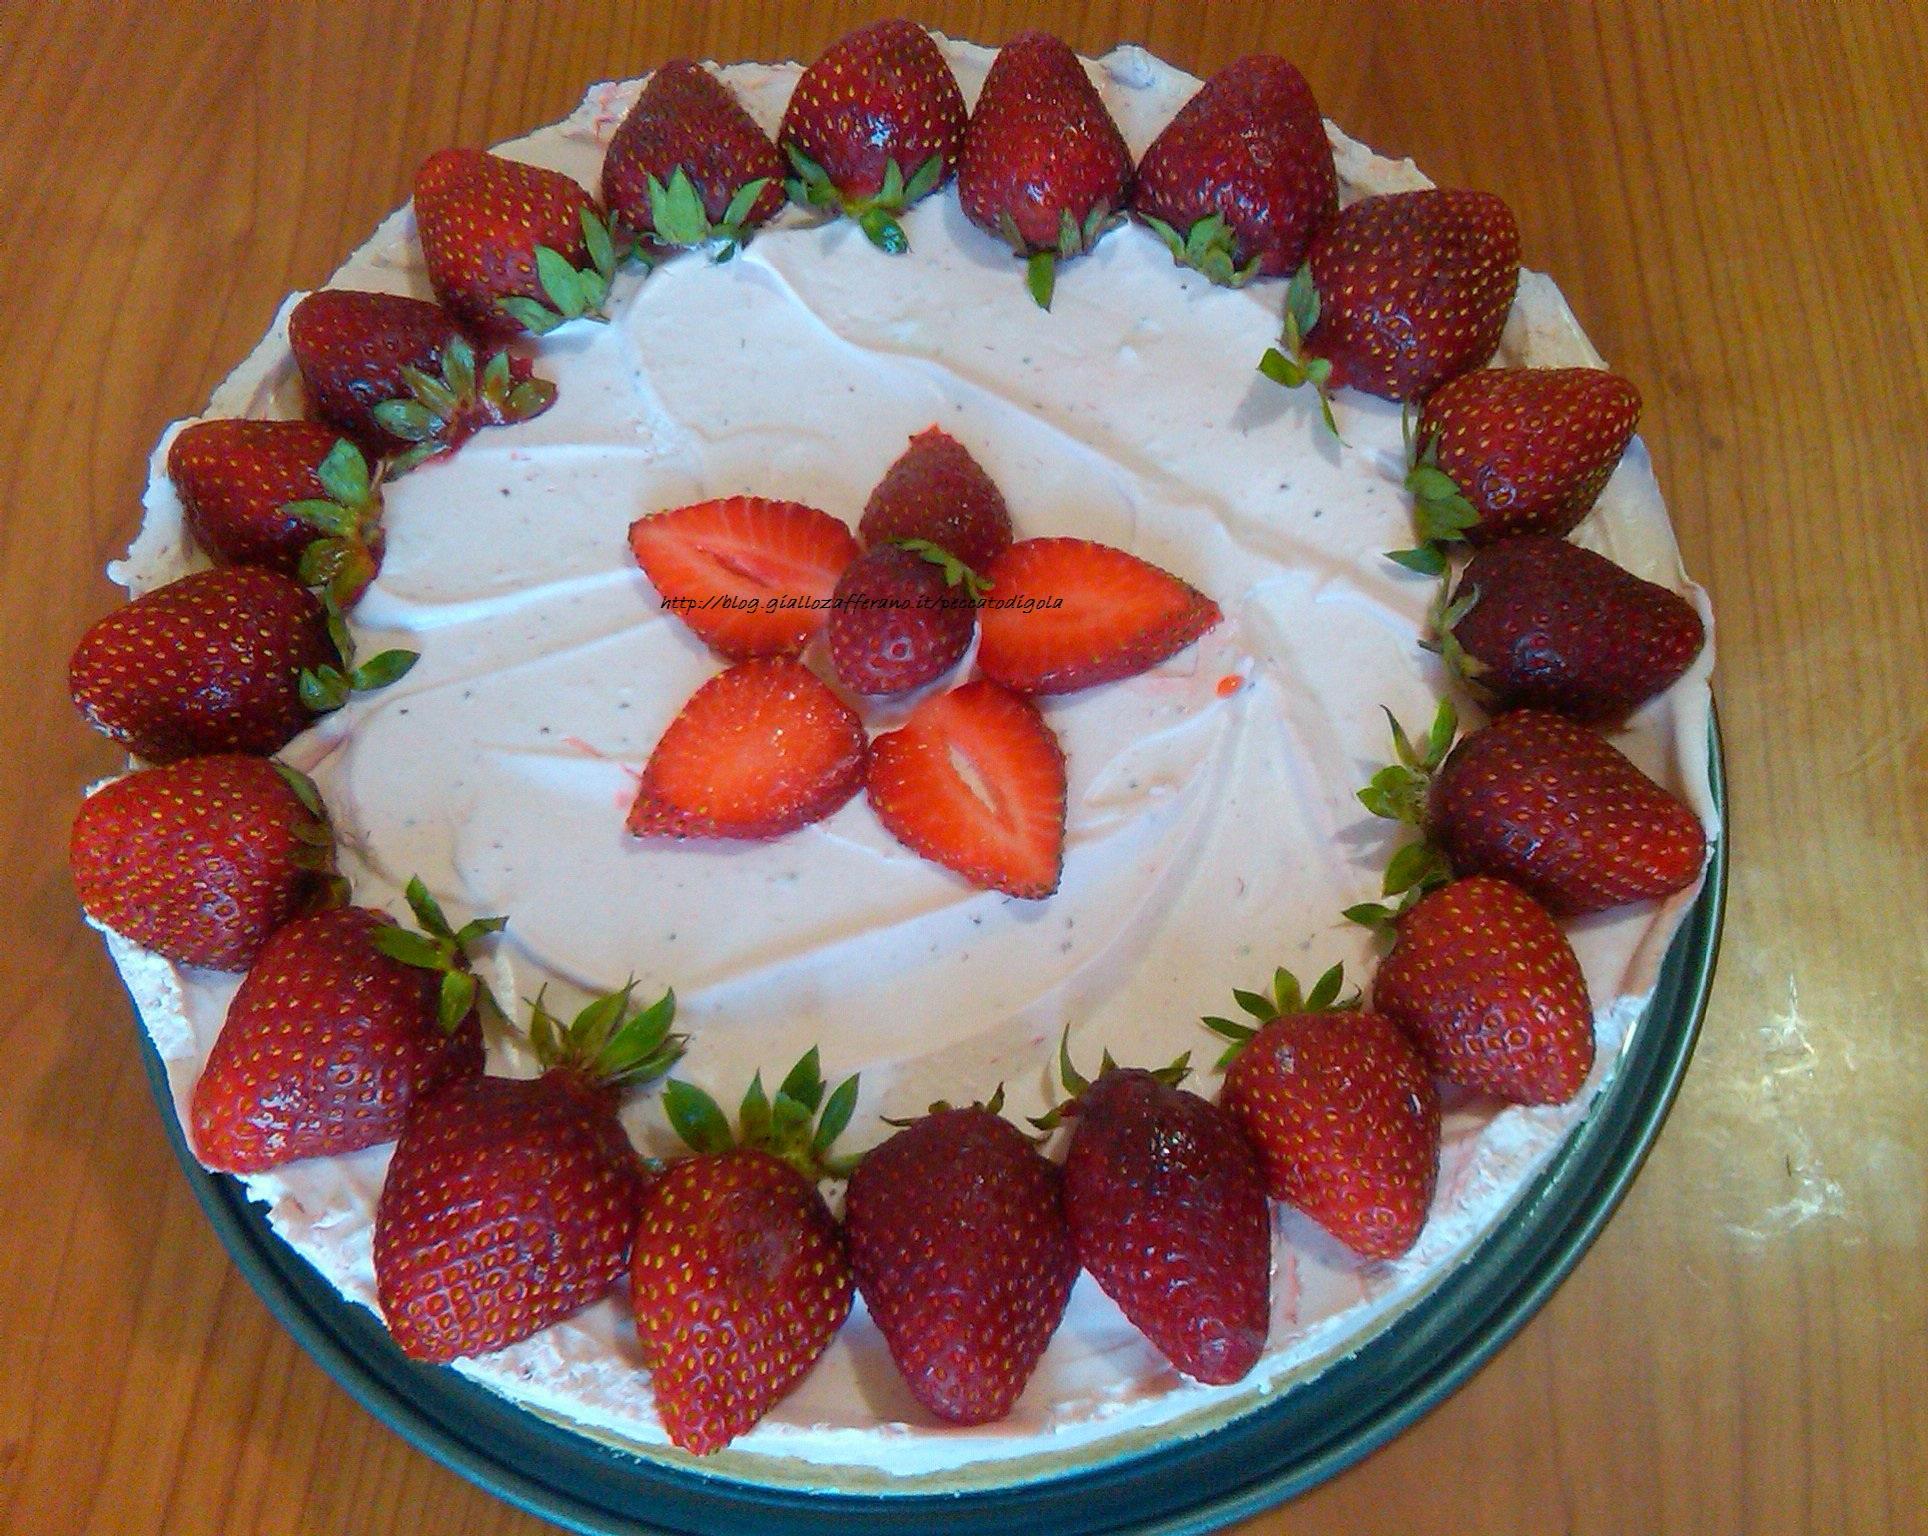 6) la torta fredda allo yogurt pronta